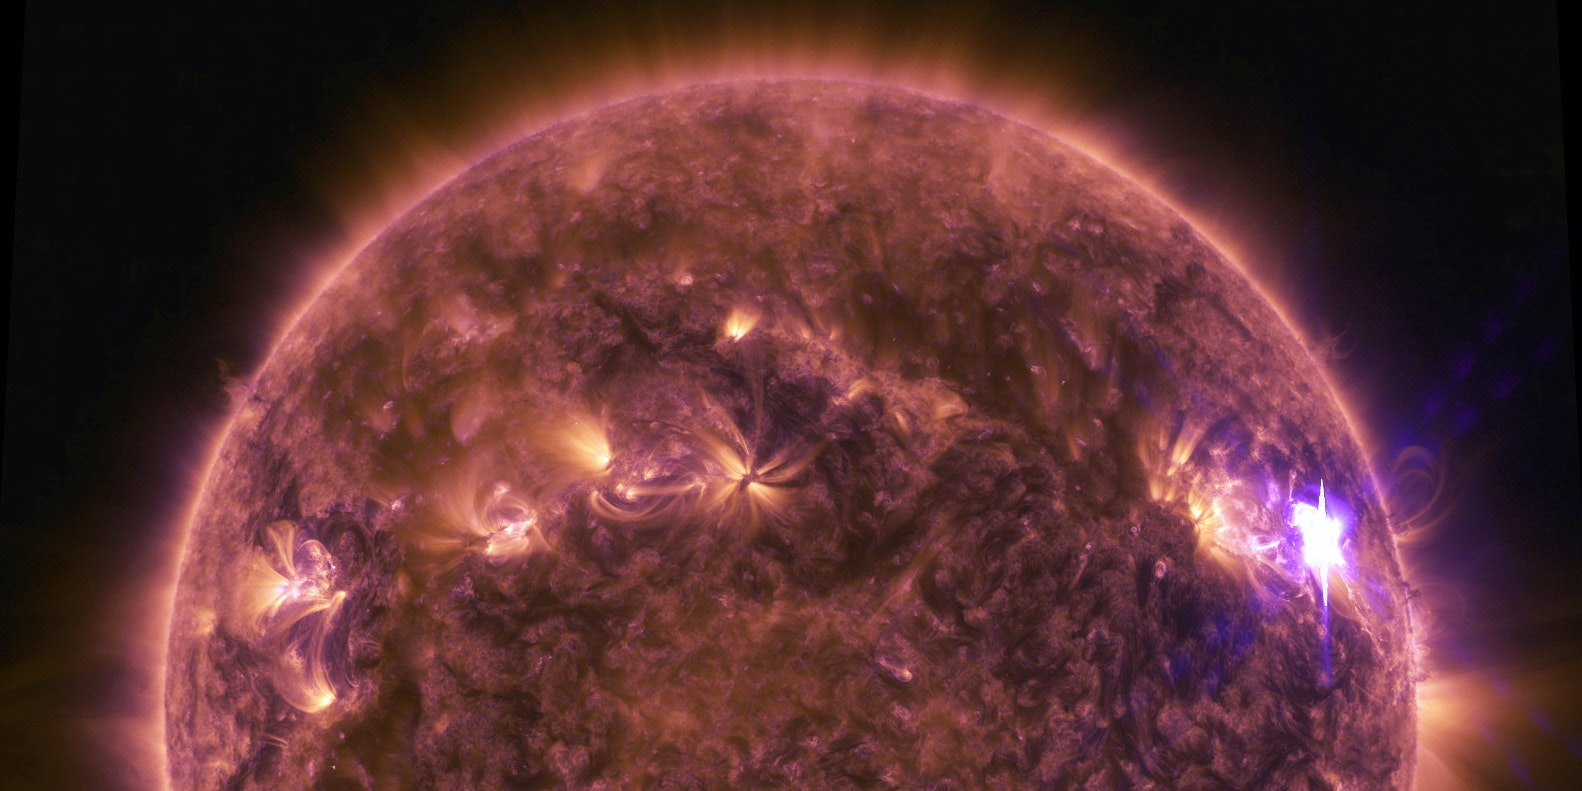 NASA's SDO spacecraft captured some sweet views of a solar flare.